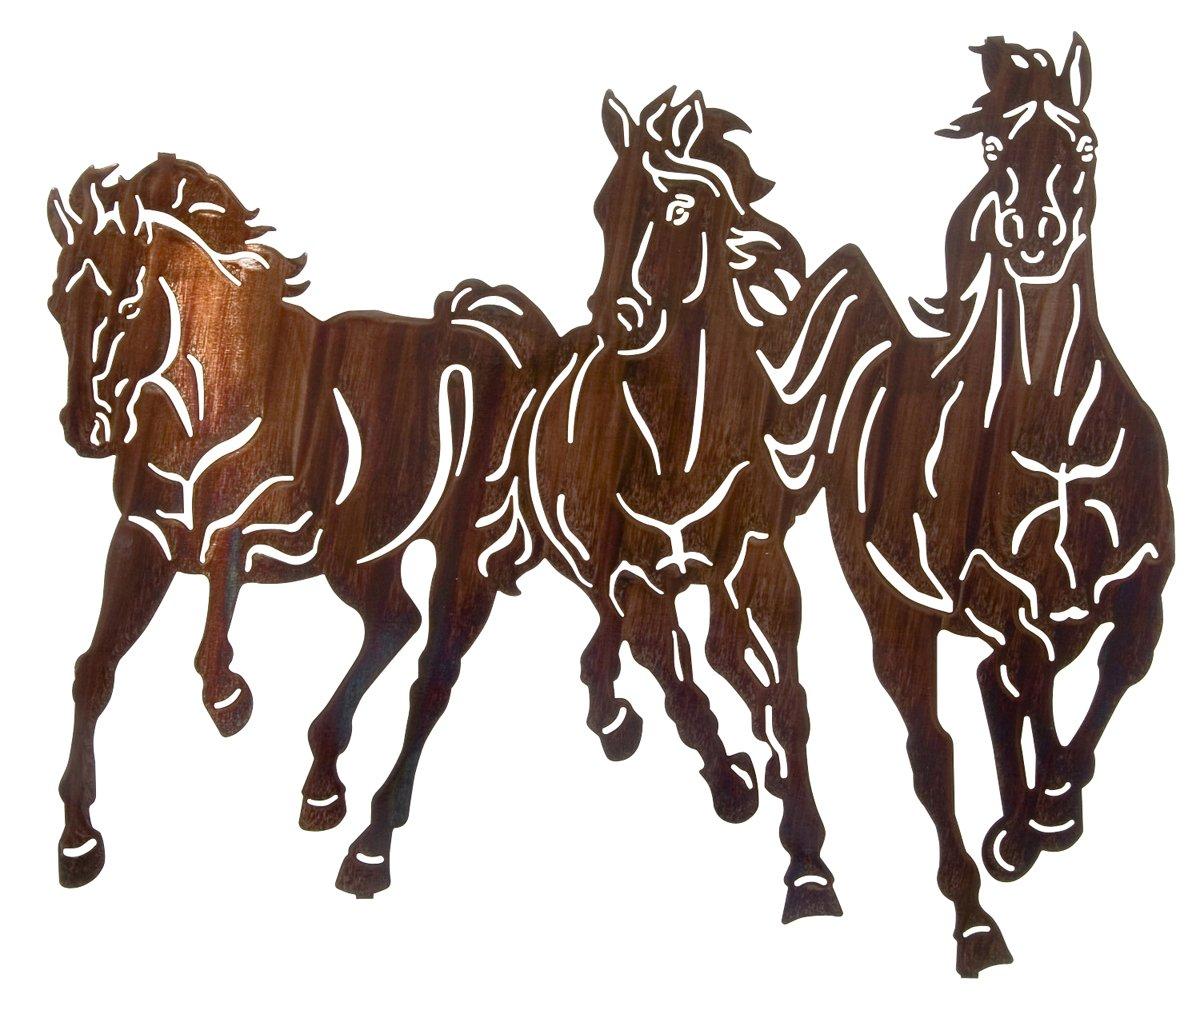 22'' Thunderstorm (Horses) Metal Wall Art